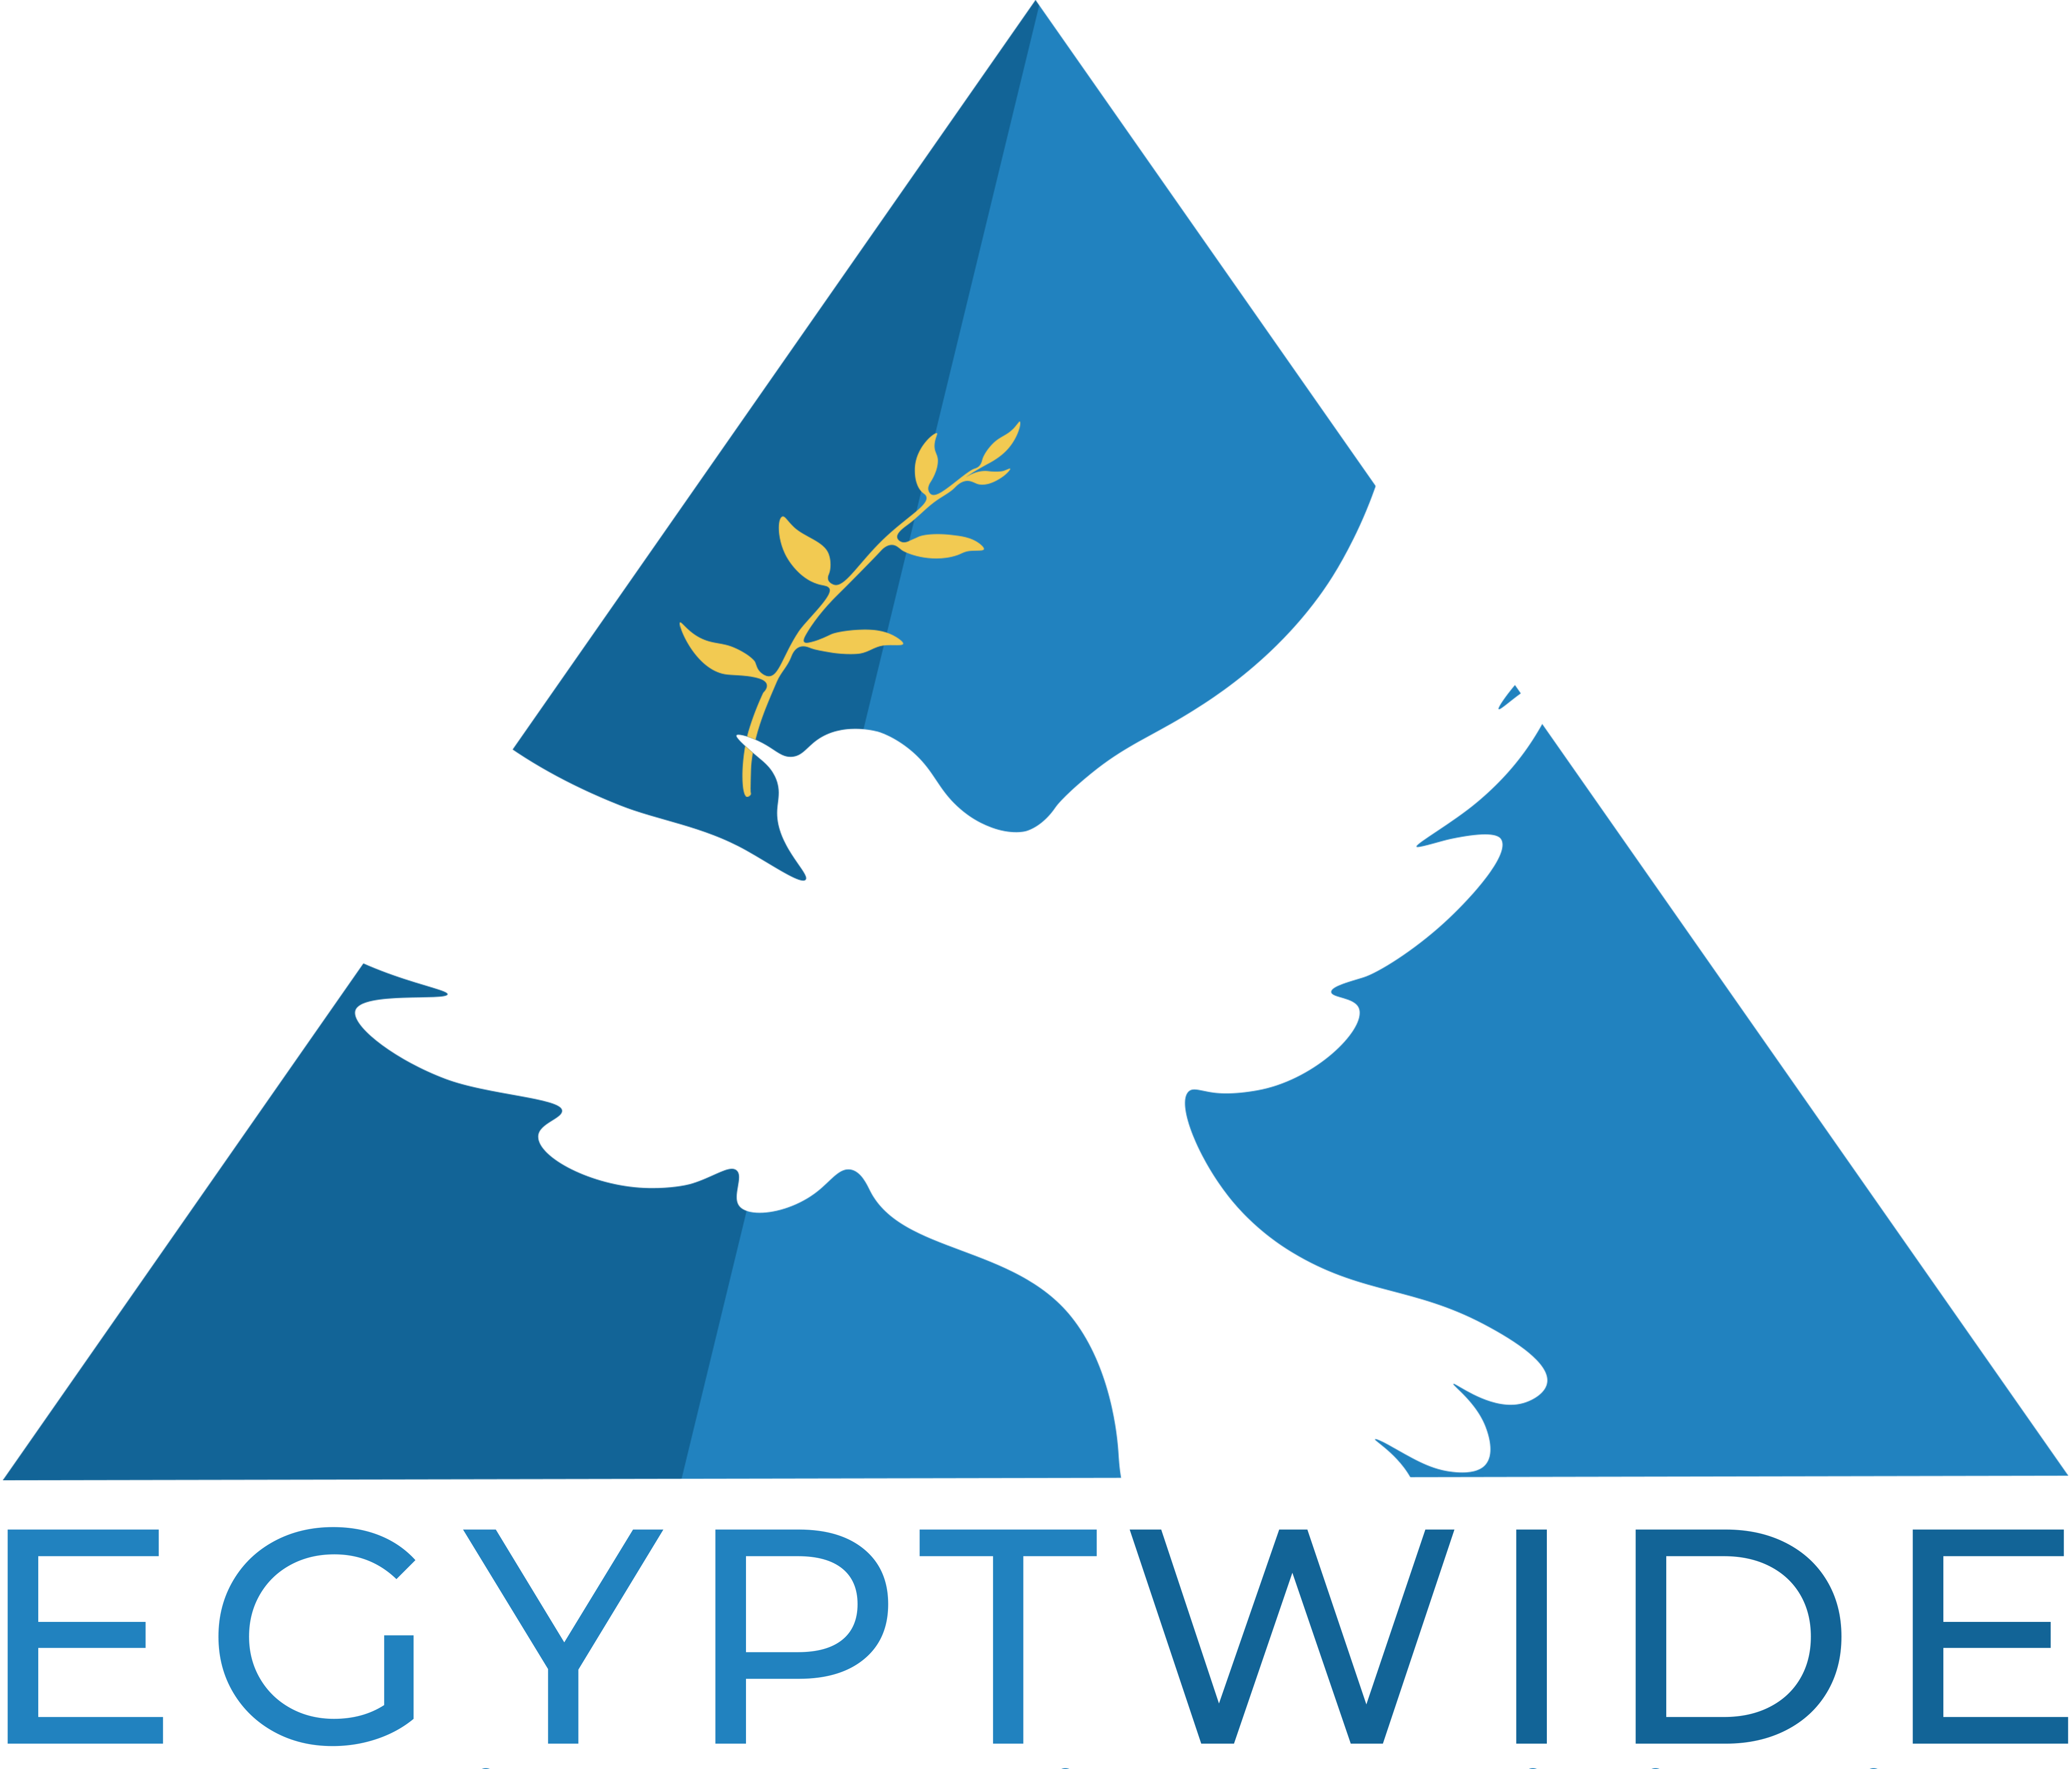 EgyptWide-logo